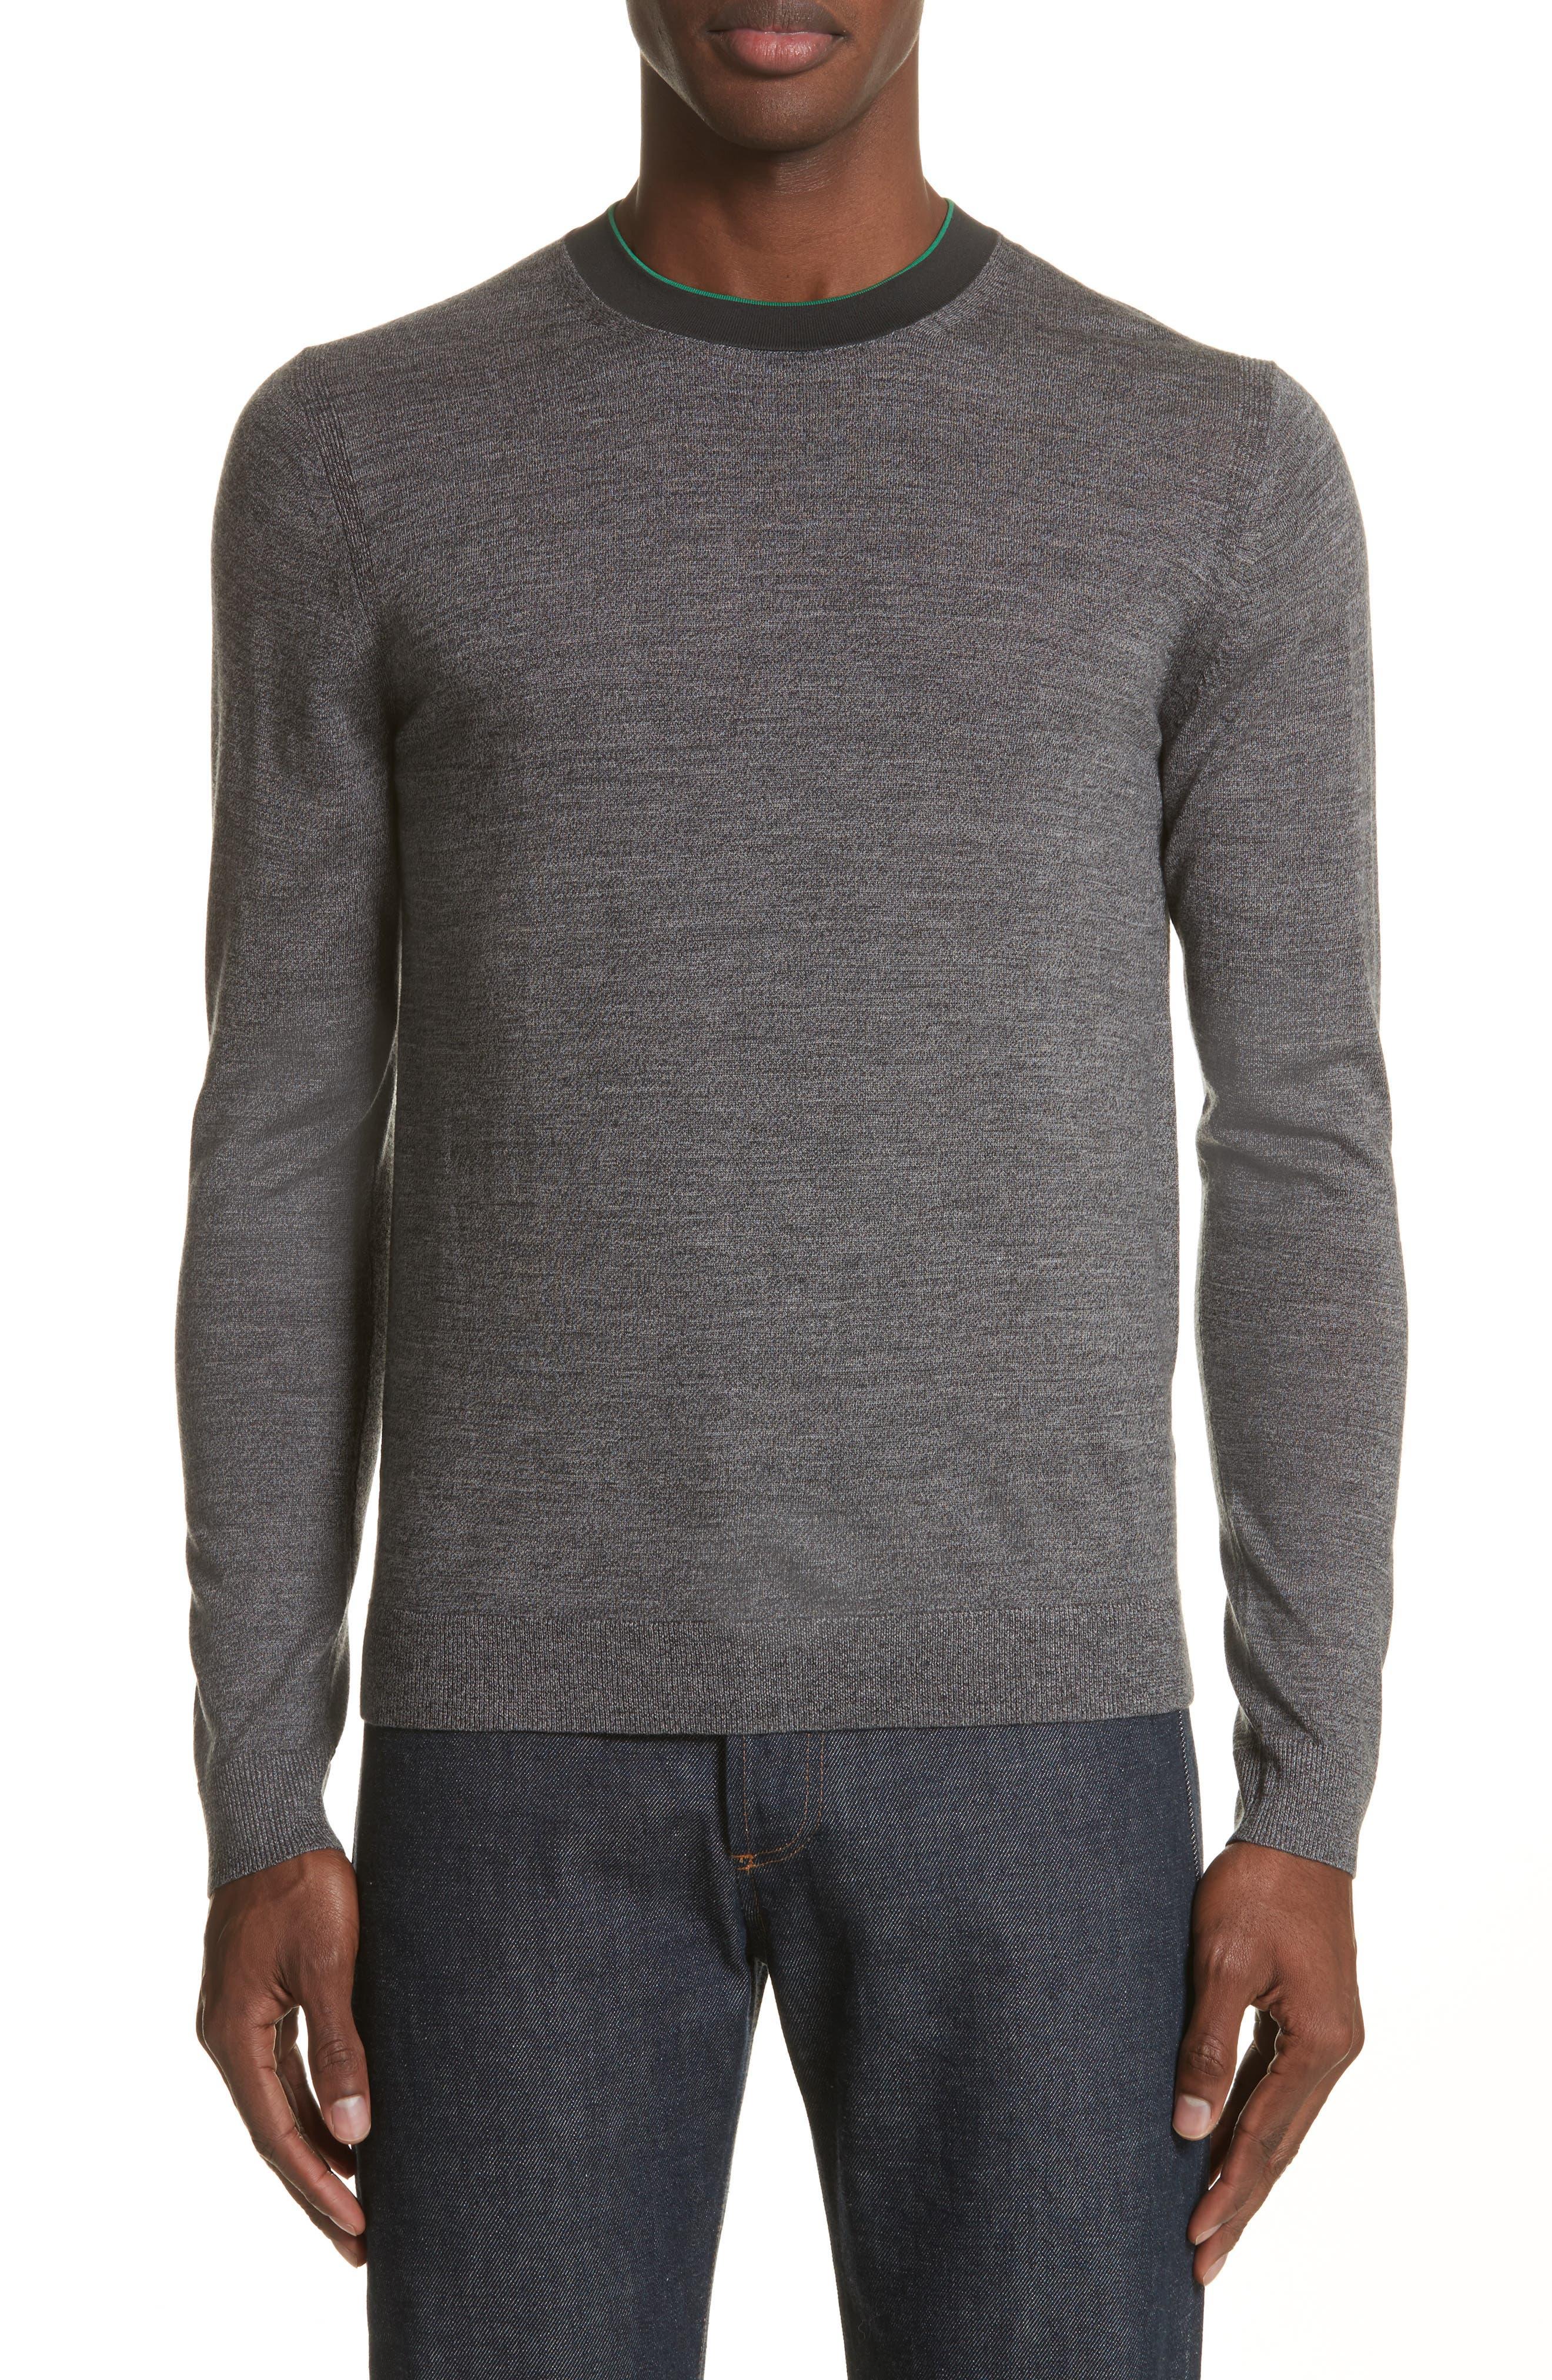 Crewneck Merino Wool Blend Sweater,                             Main thumbnail 1, color,                             021